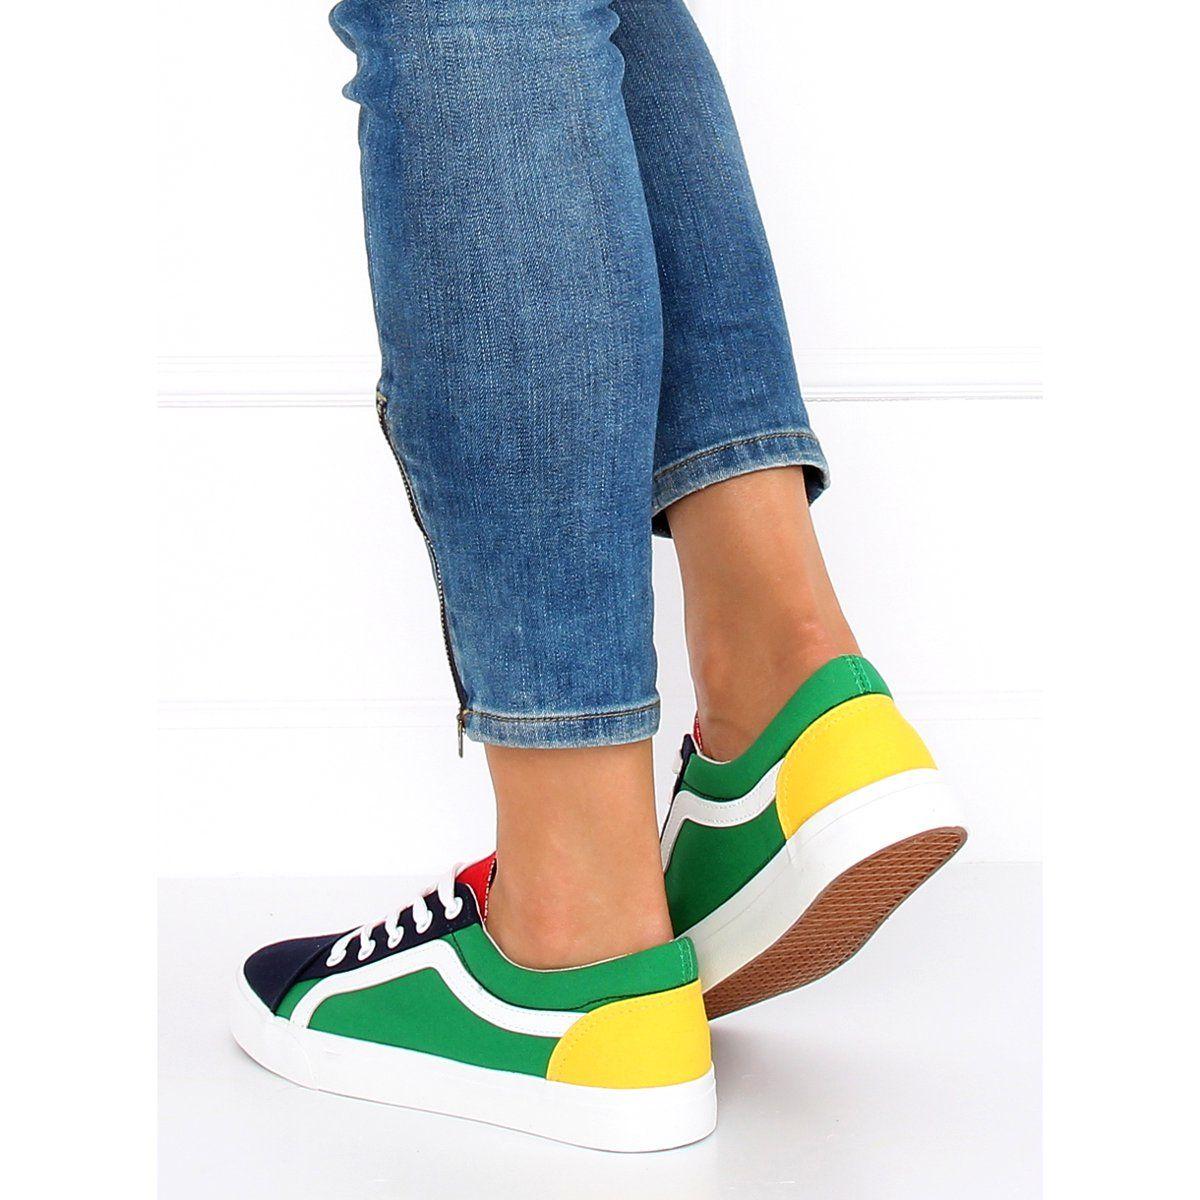 Trampki Damskie Wielokolorowe Bl156 Navy Womens Sneakers Sneakers Multicolor Womens Fashion Sneakers